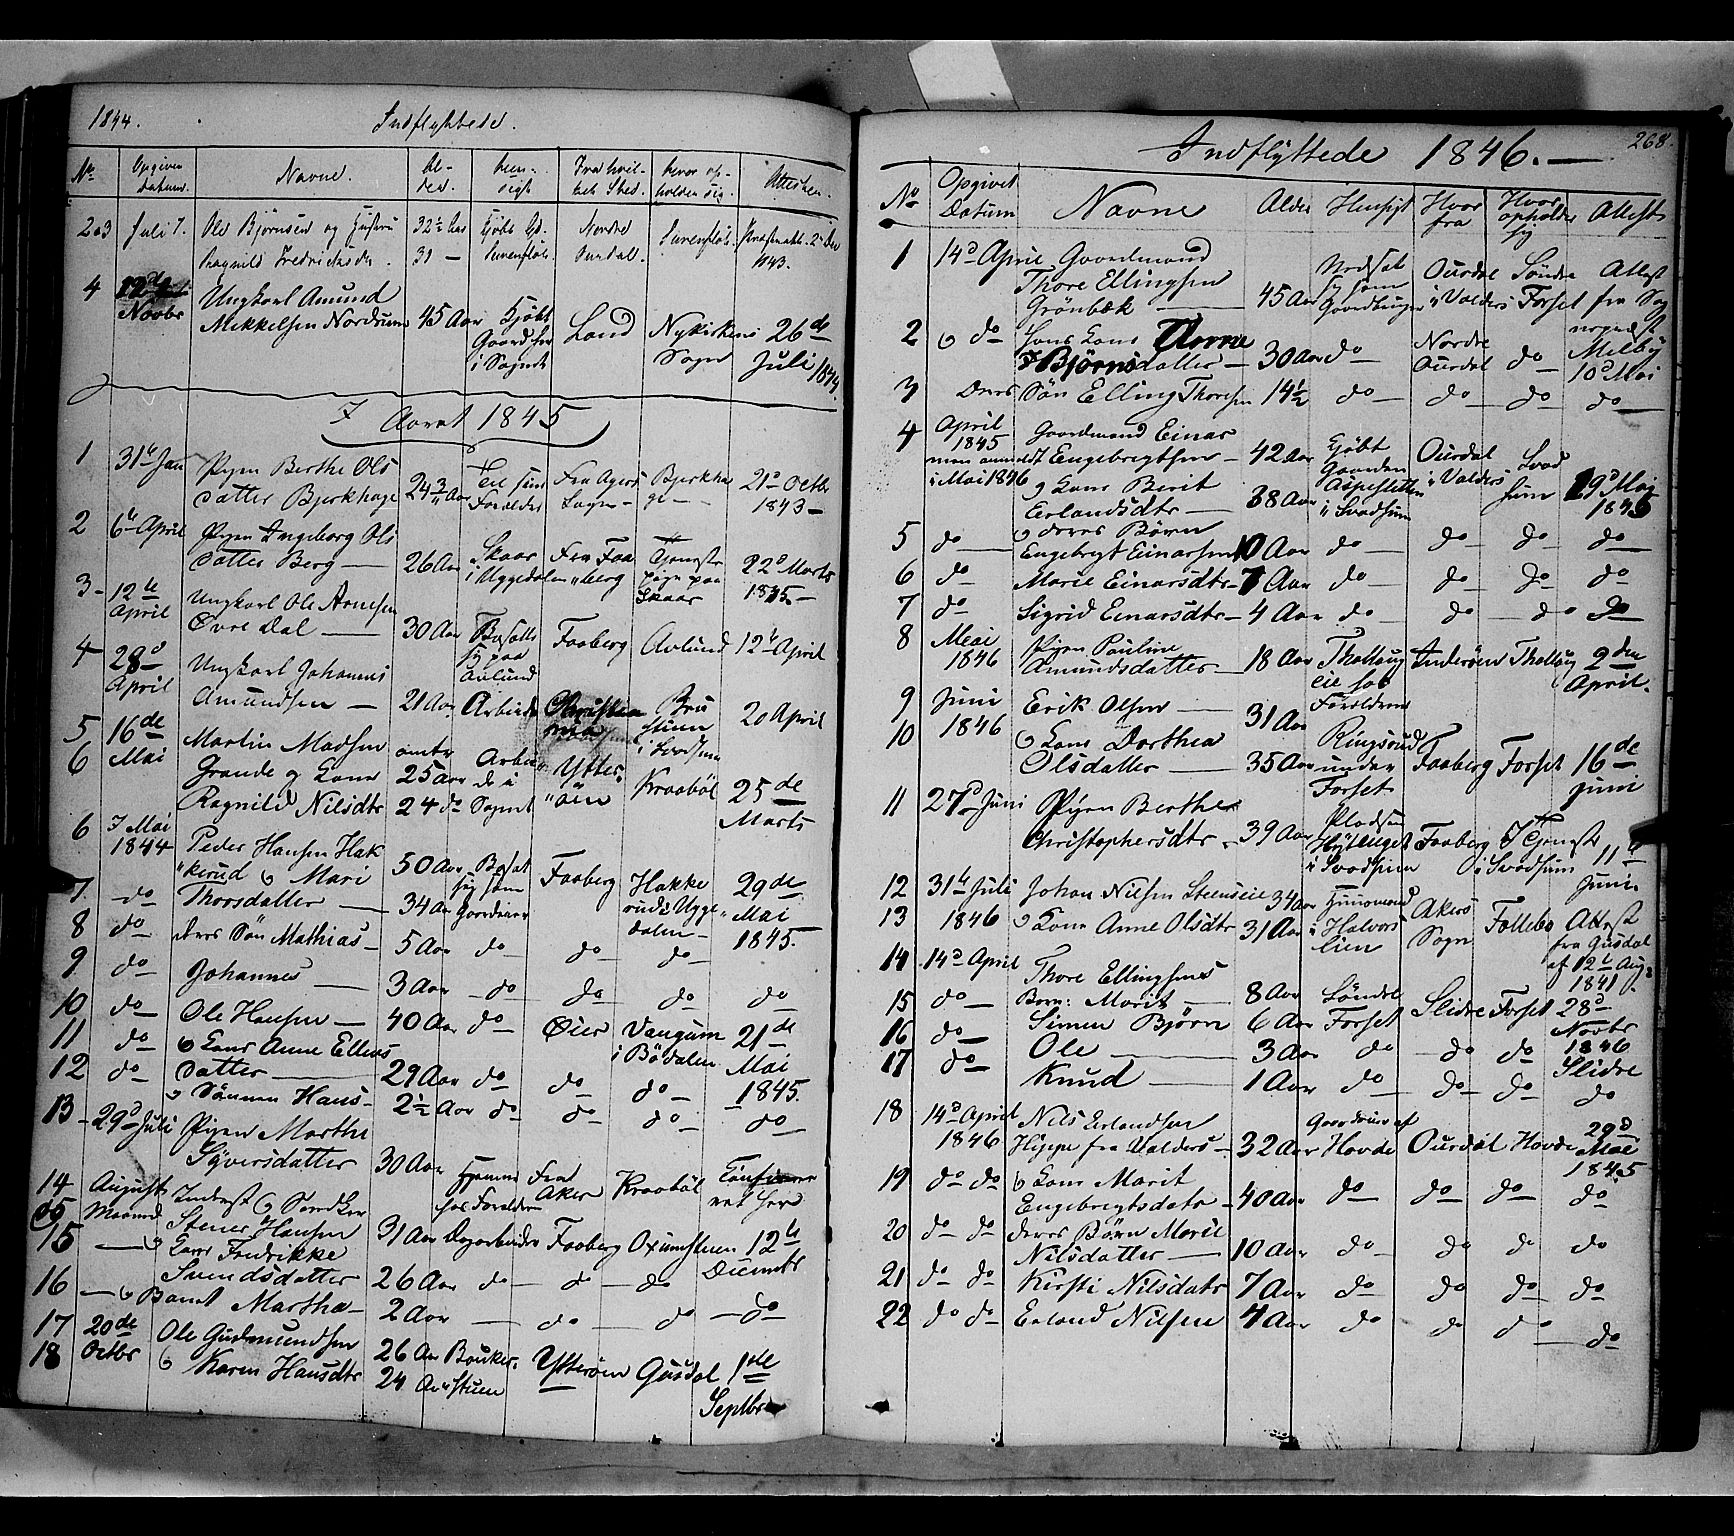 SAH, Gausdal prestekontor, Ministerialbok nr. 7, 1840-1850, s. 268